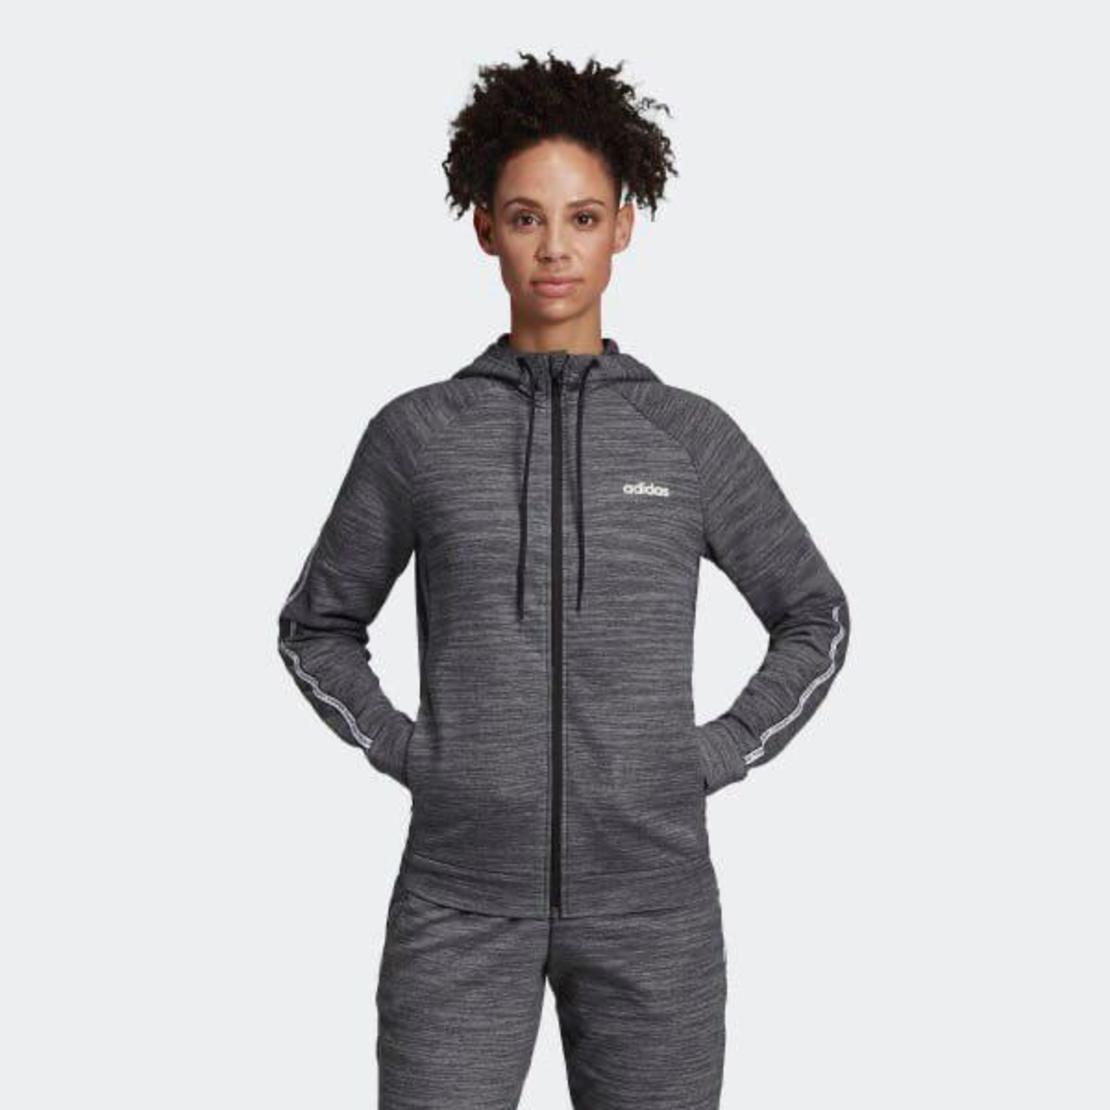 חליפת אדידס לנשים Adidas Xpressive Tracksuit